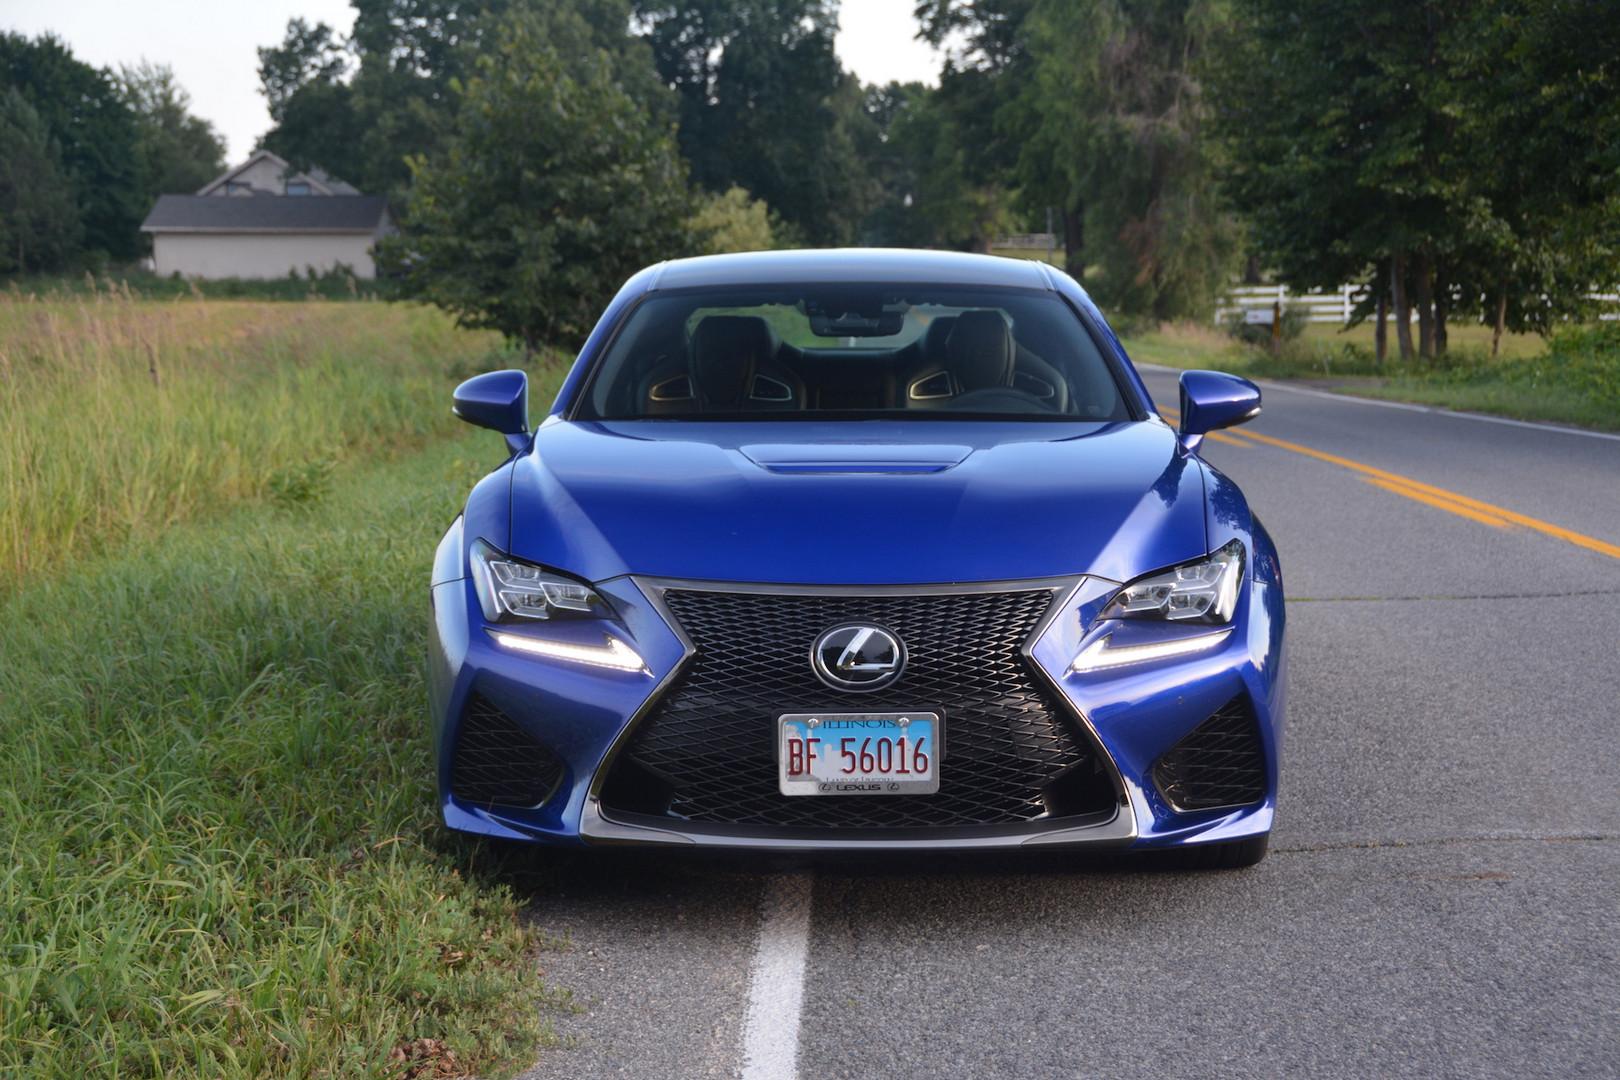 2019 Lexus RC F Front